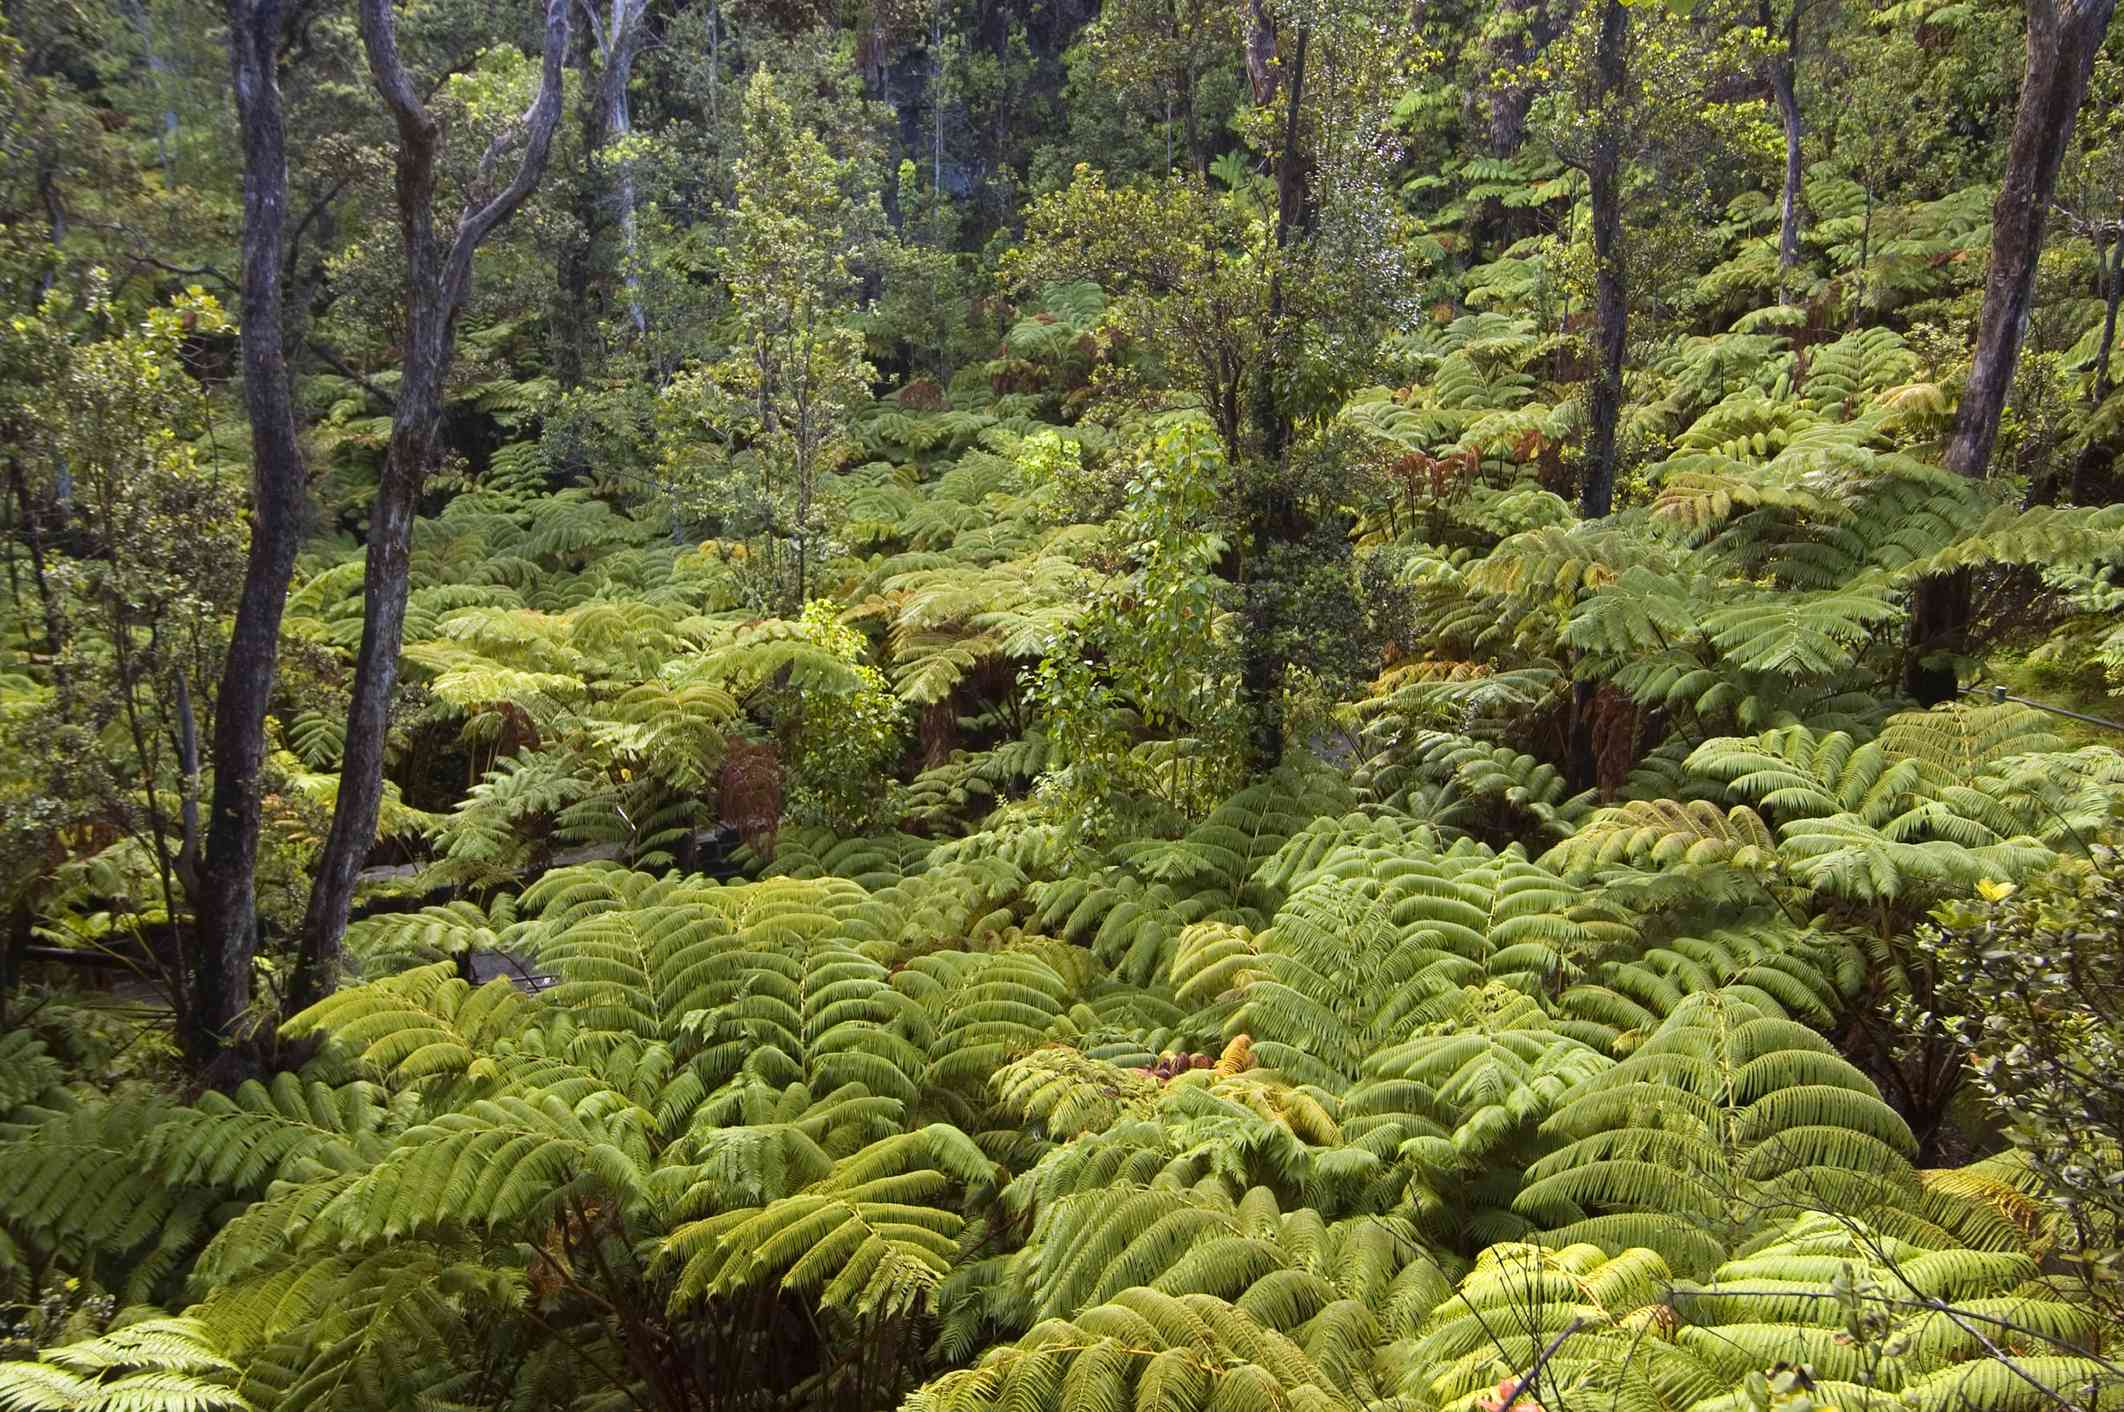 Ferns in the rainforest in Volcanoes National Park